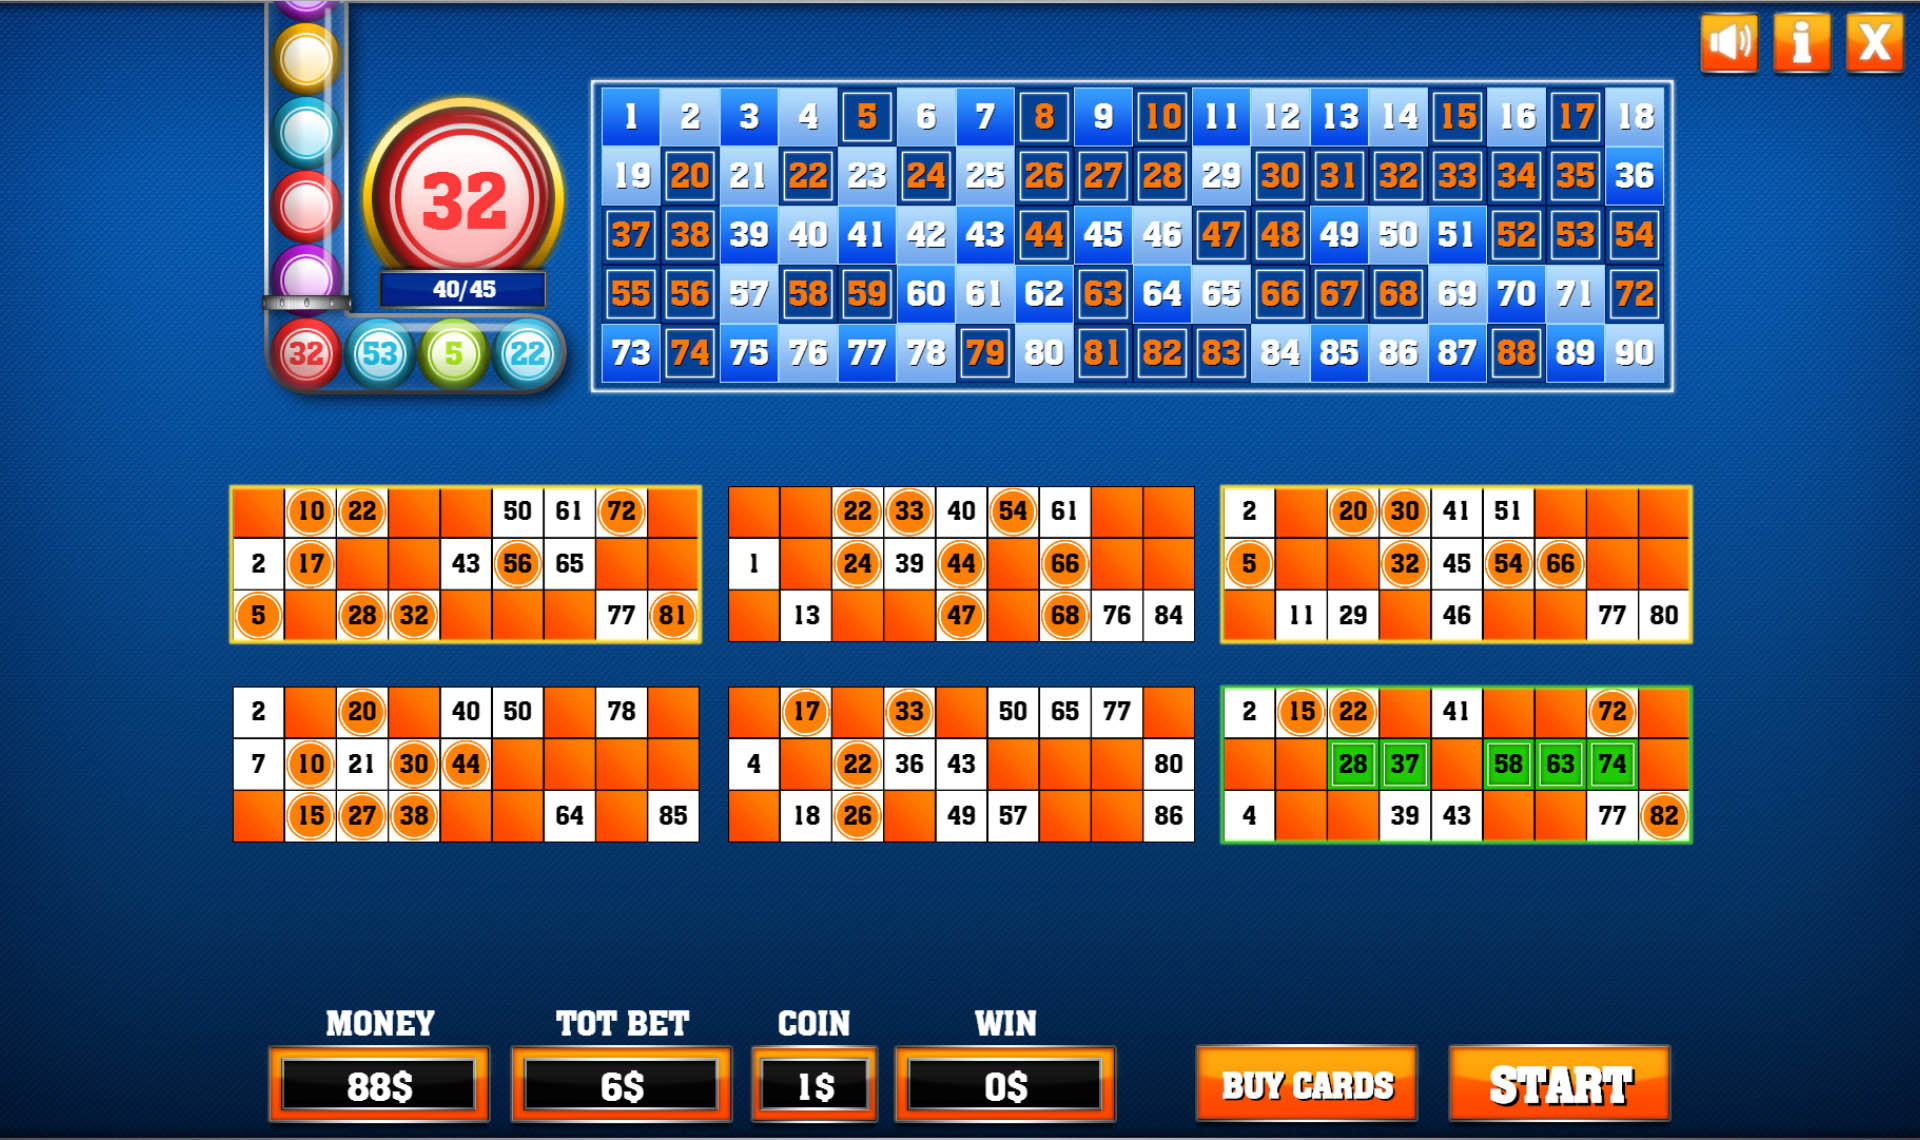 Is Bingo Gambling